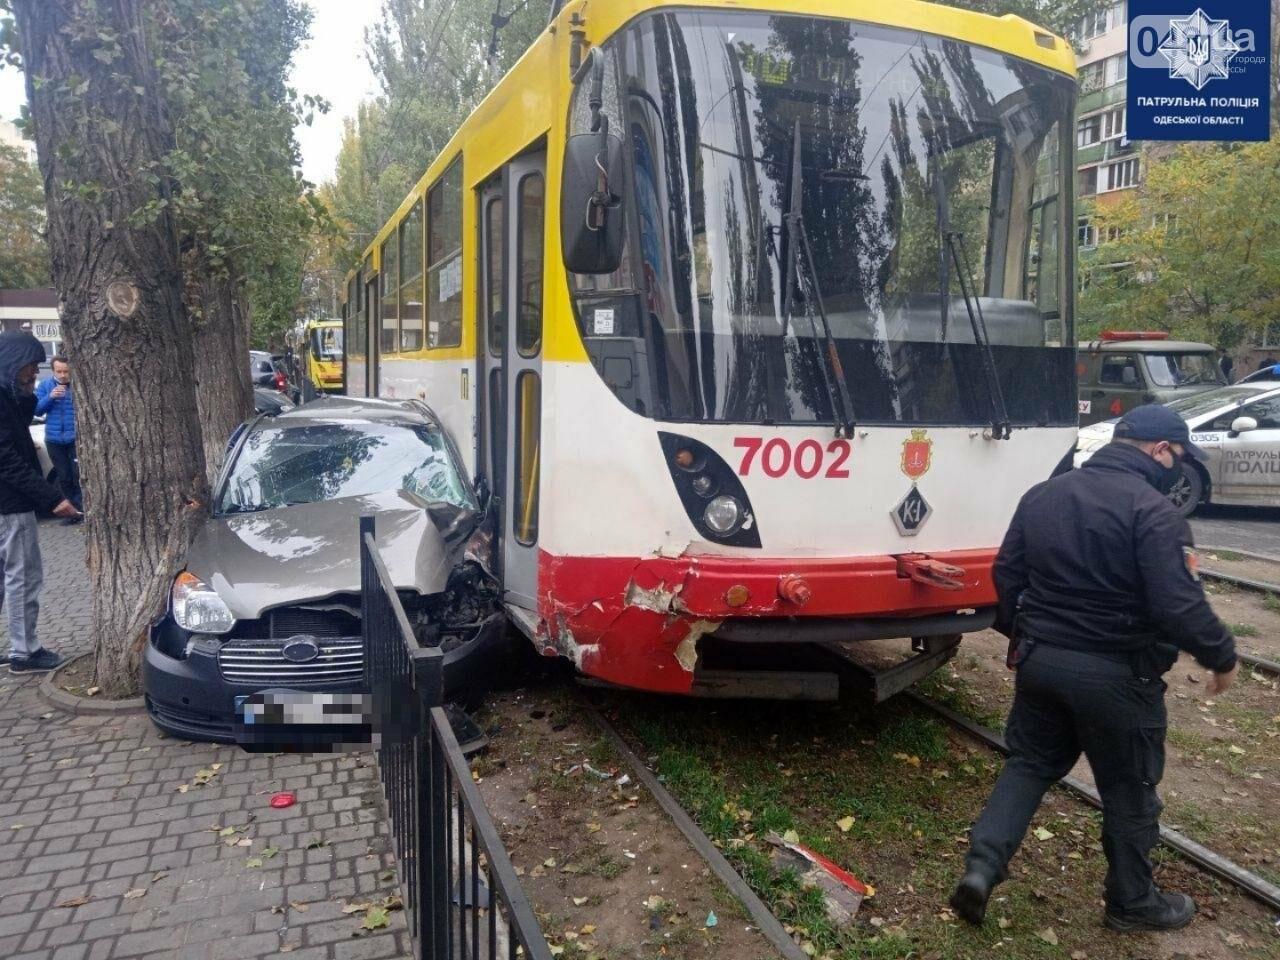 В Одессе трамвай раздавил автомобиль Hyundai, - ФОТО, фото-1